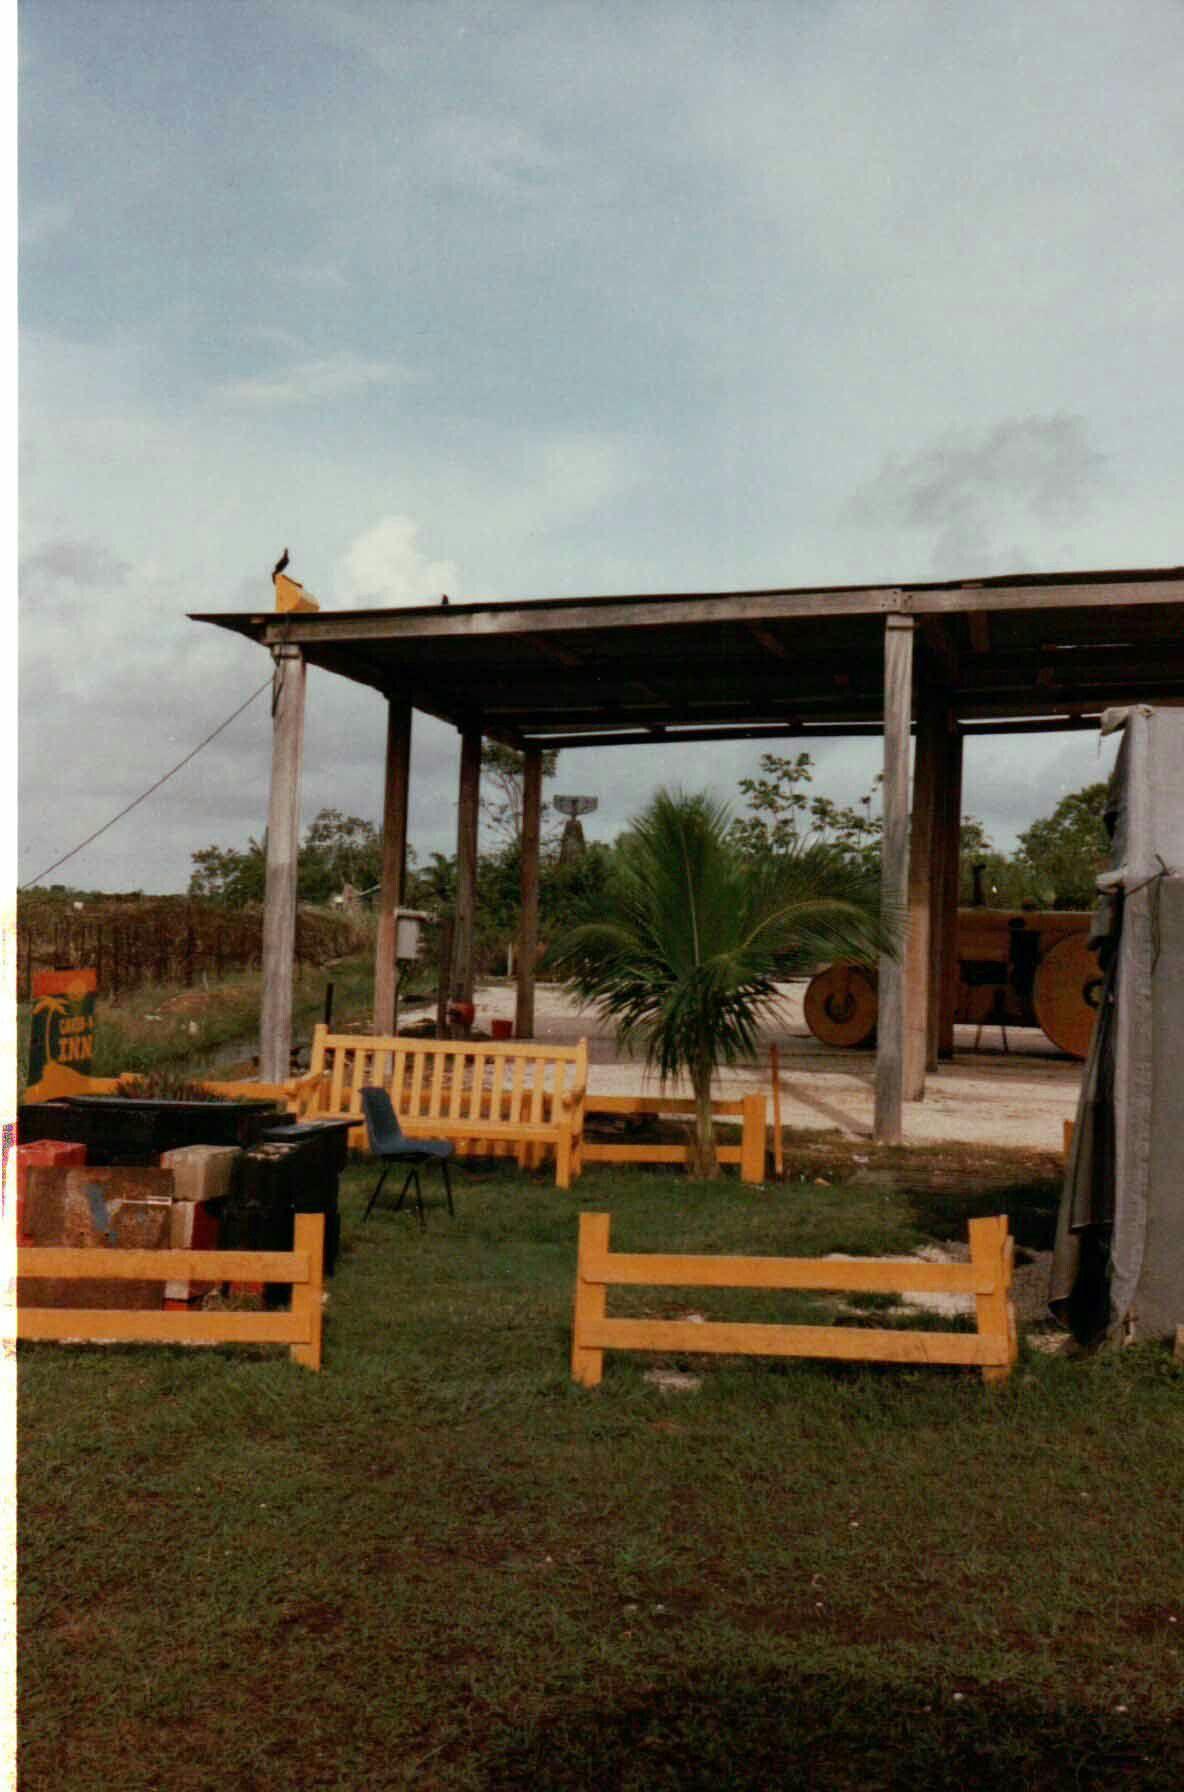 Outdoor structures image by AL BISH on Butcher Radar